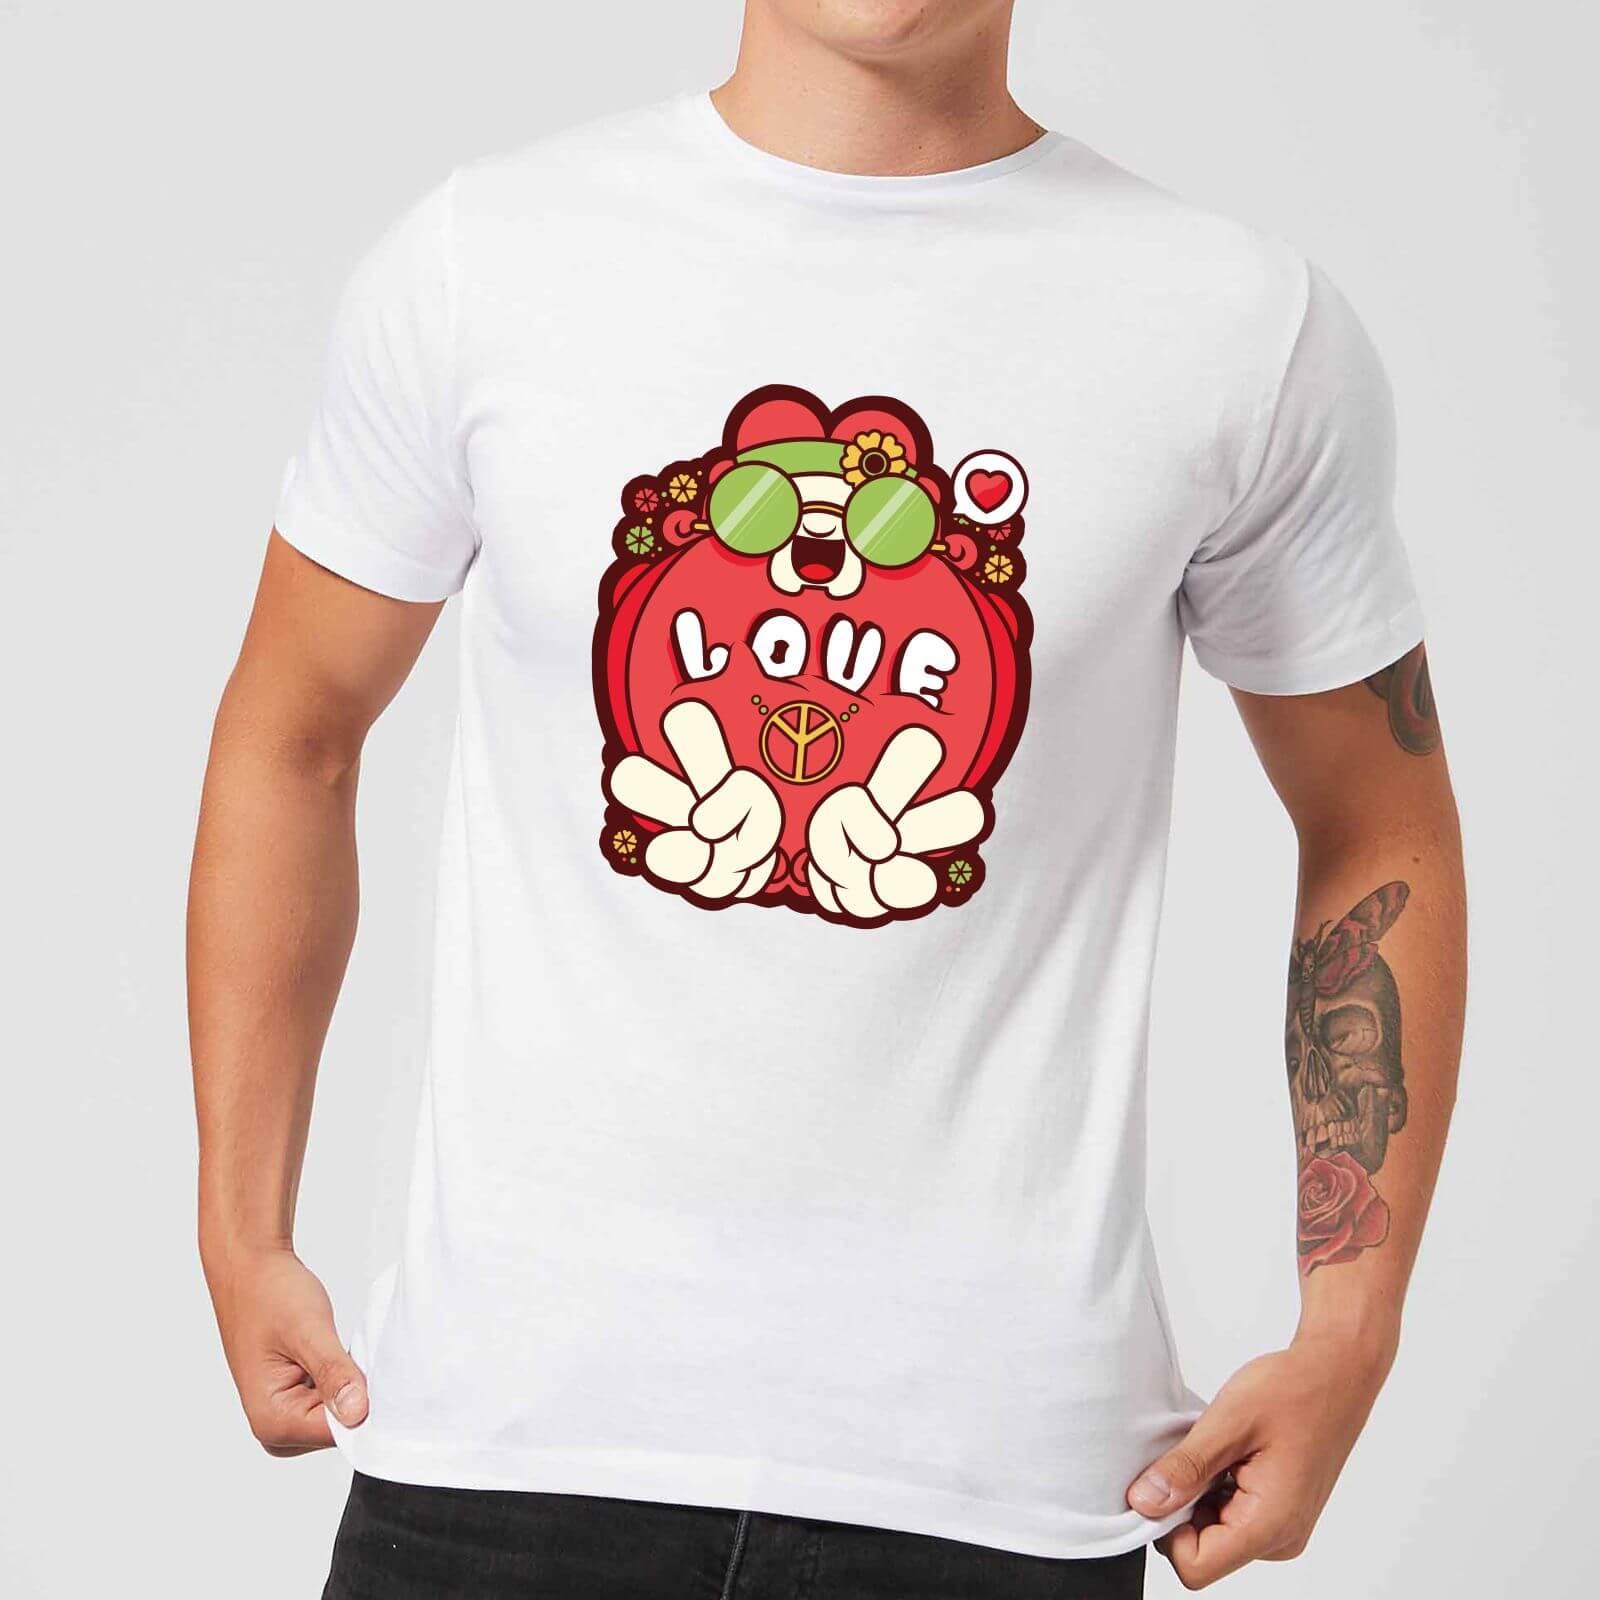 IWOOT Hippie Love Cartoon Men's T-Shirt - White - S - White-male